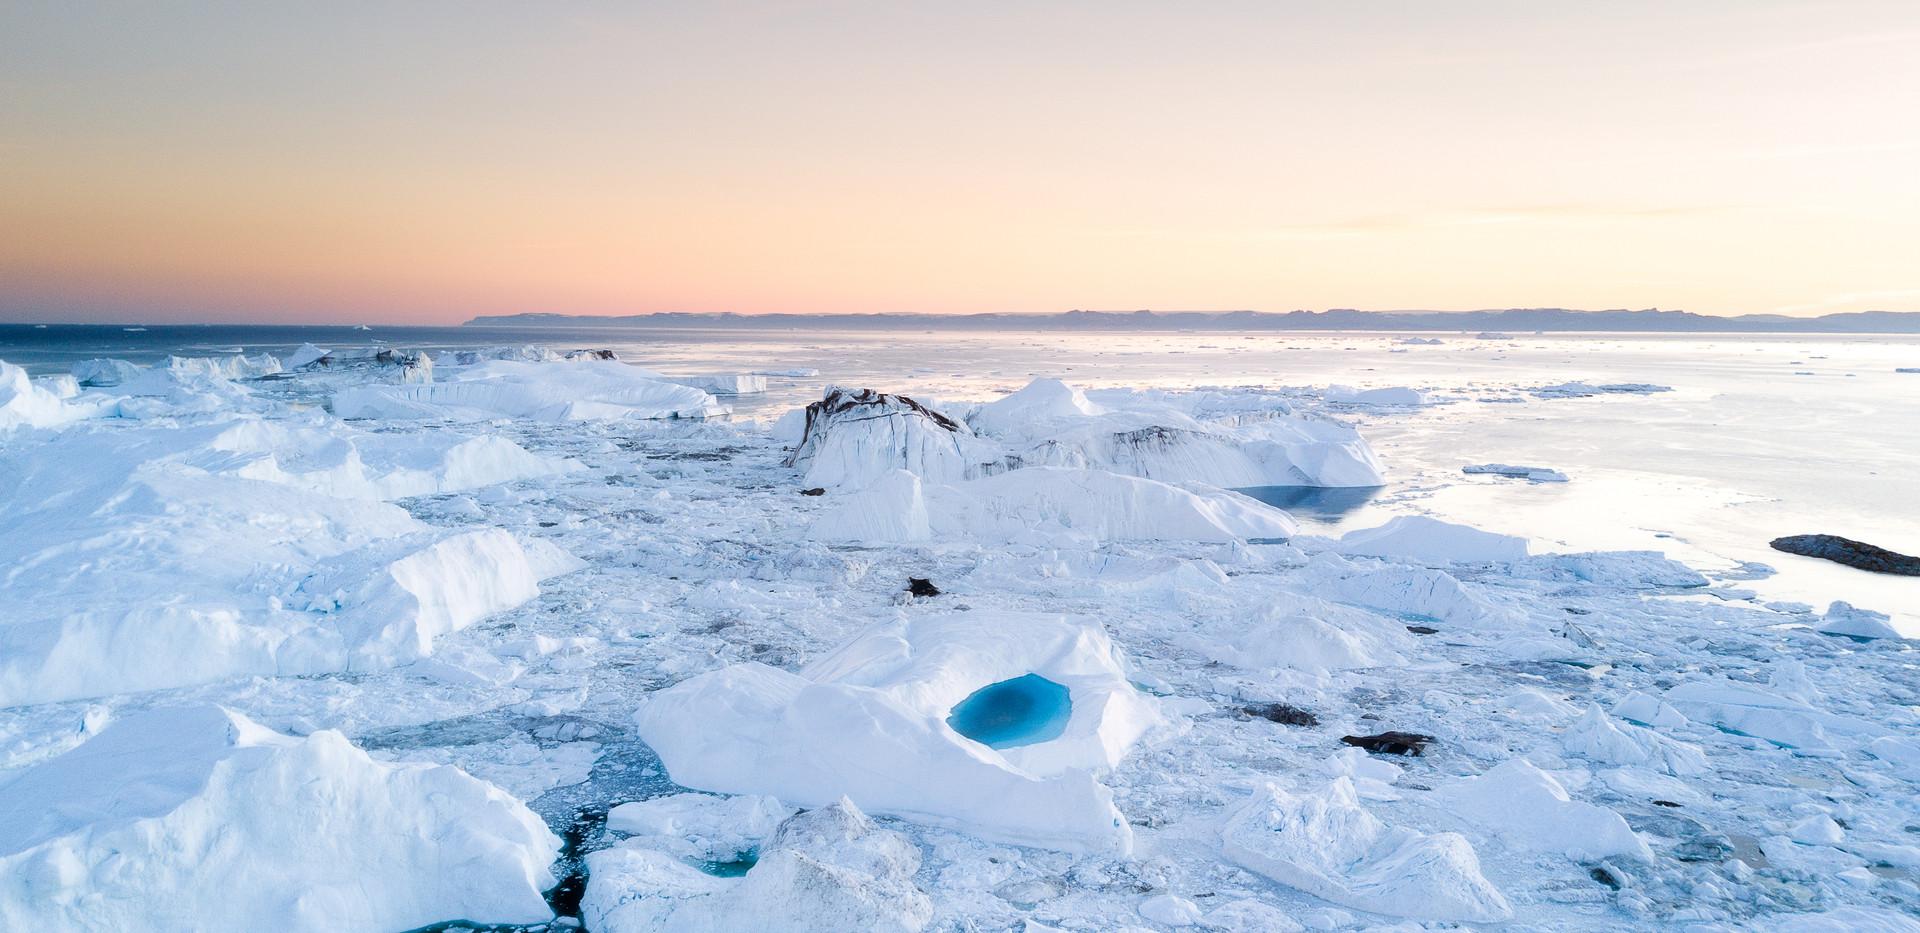 Artica Adventure Photo Tours